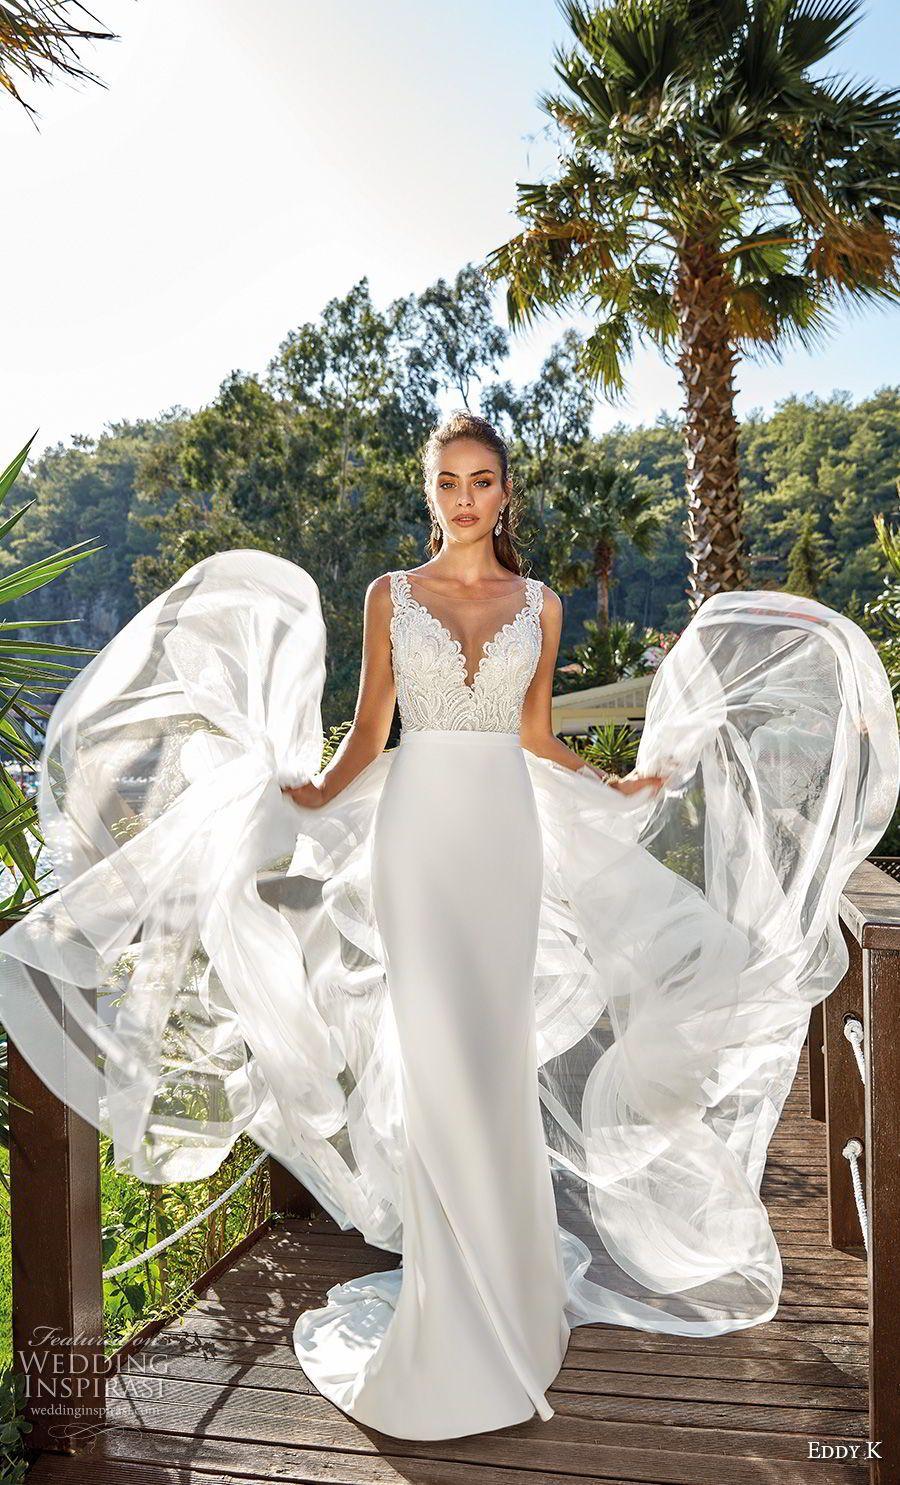 Eddy k dreams wedding dresses vestidos pinterest